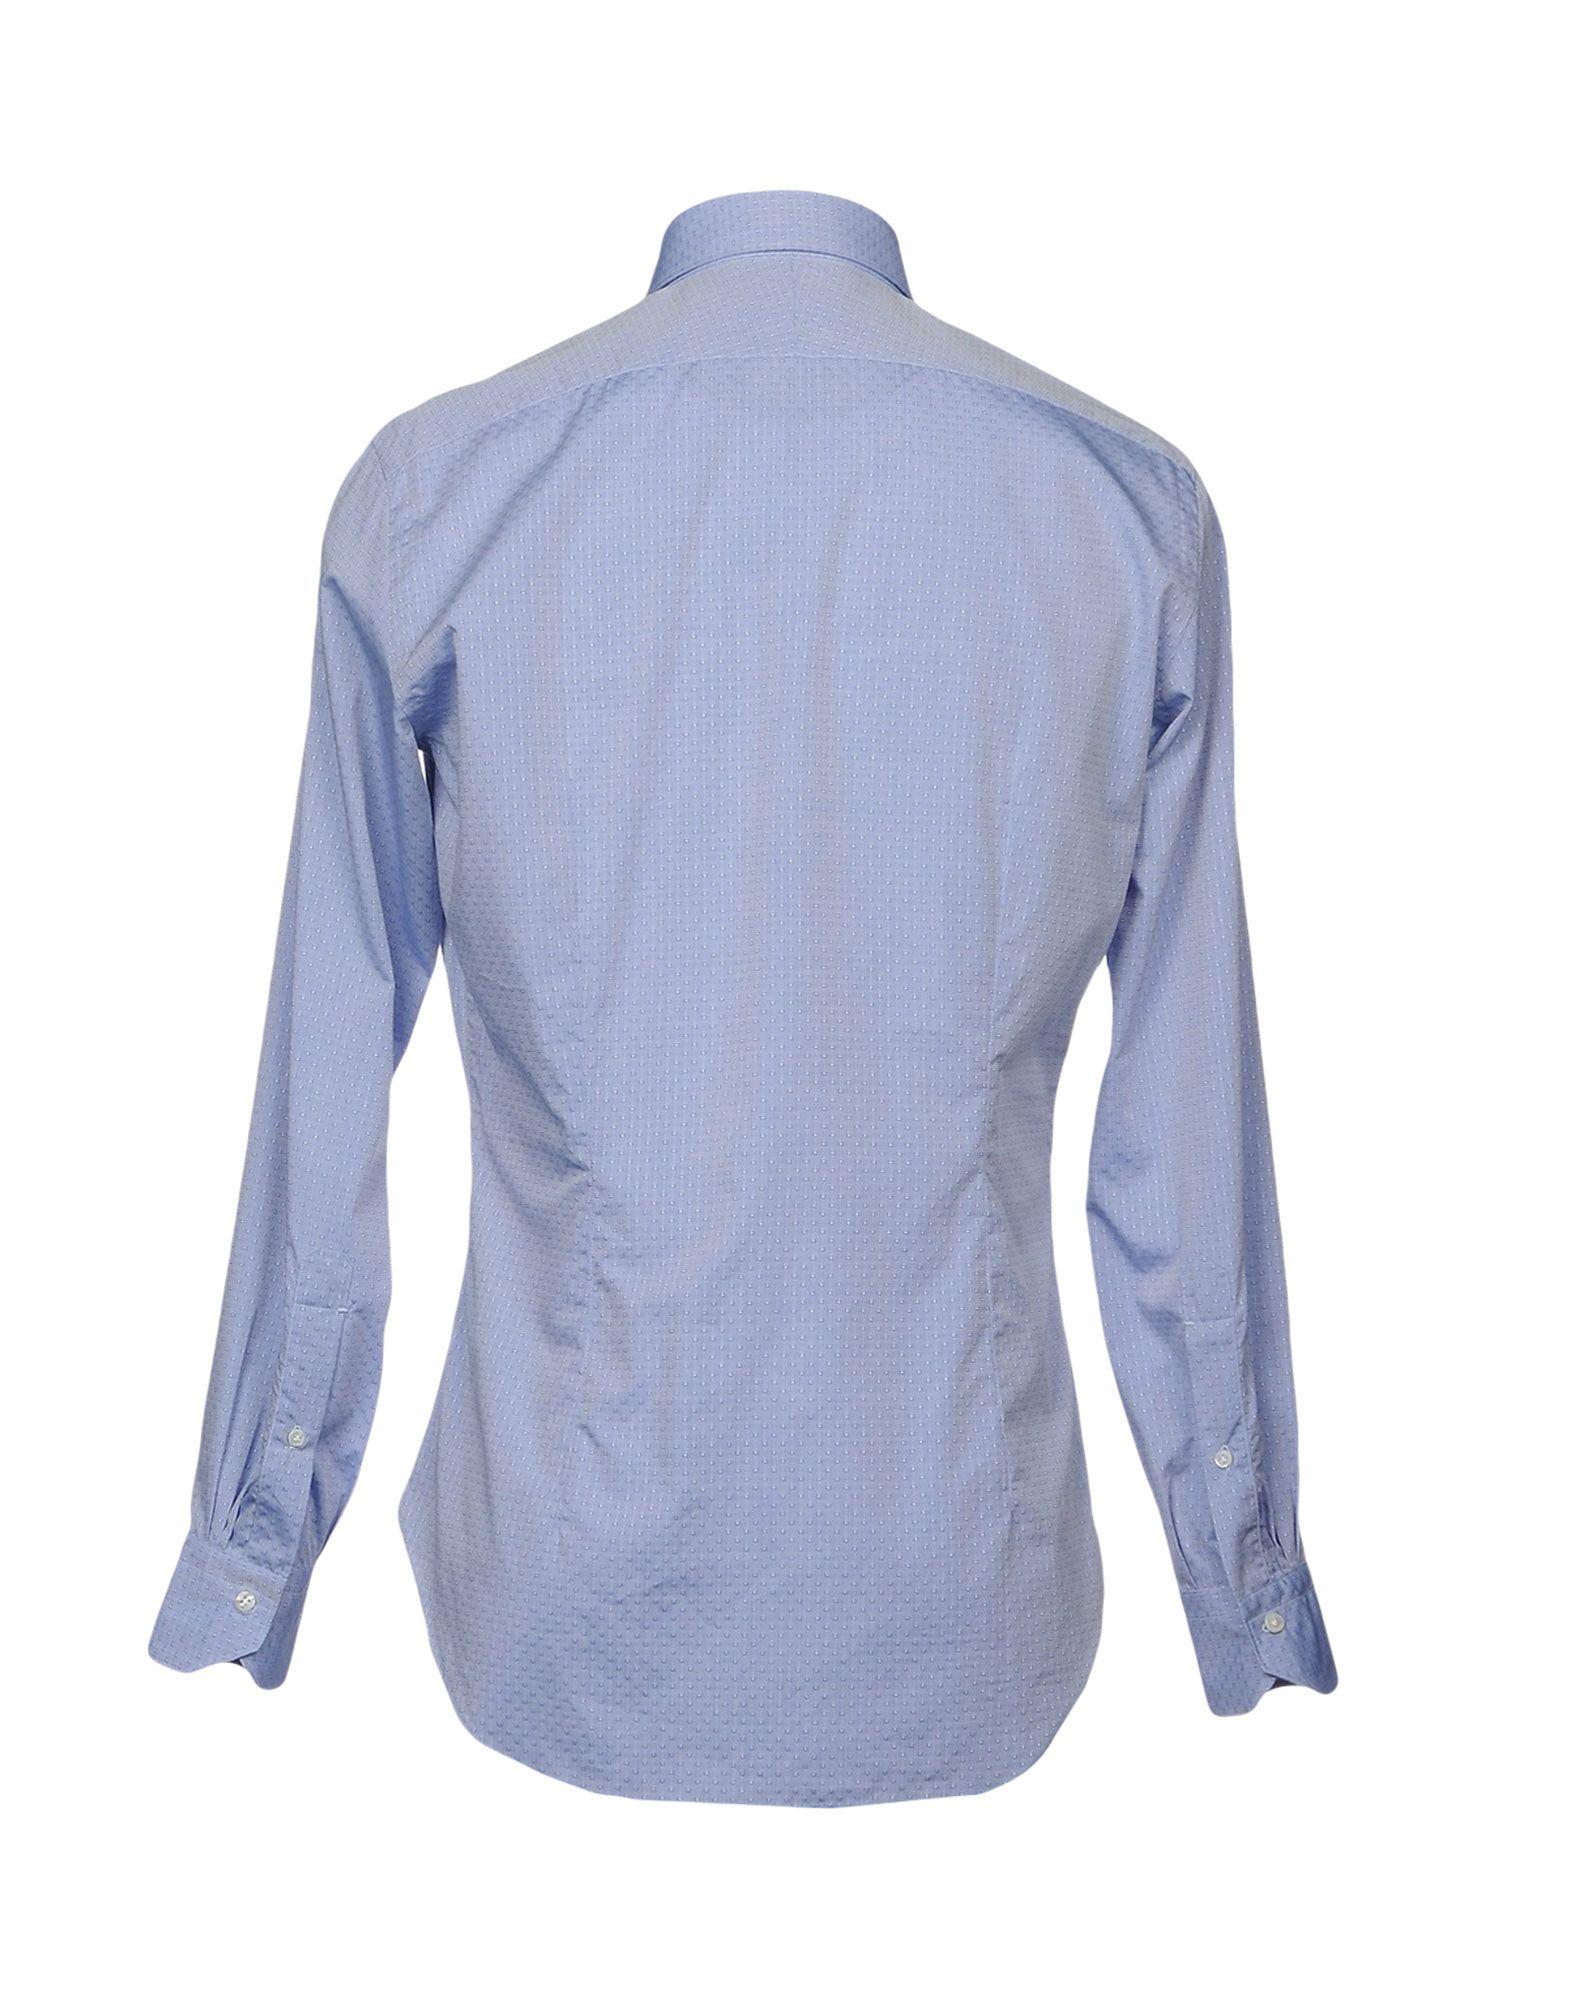 Camicia Tinta Tinta Tinta Unita Truzzi Uomo - 38704011IU cfc2ce